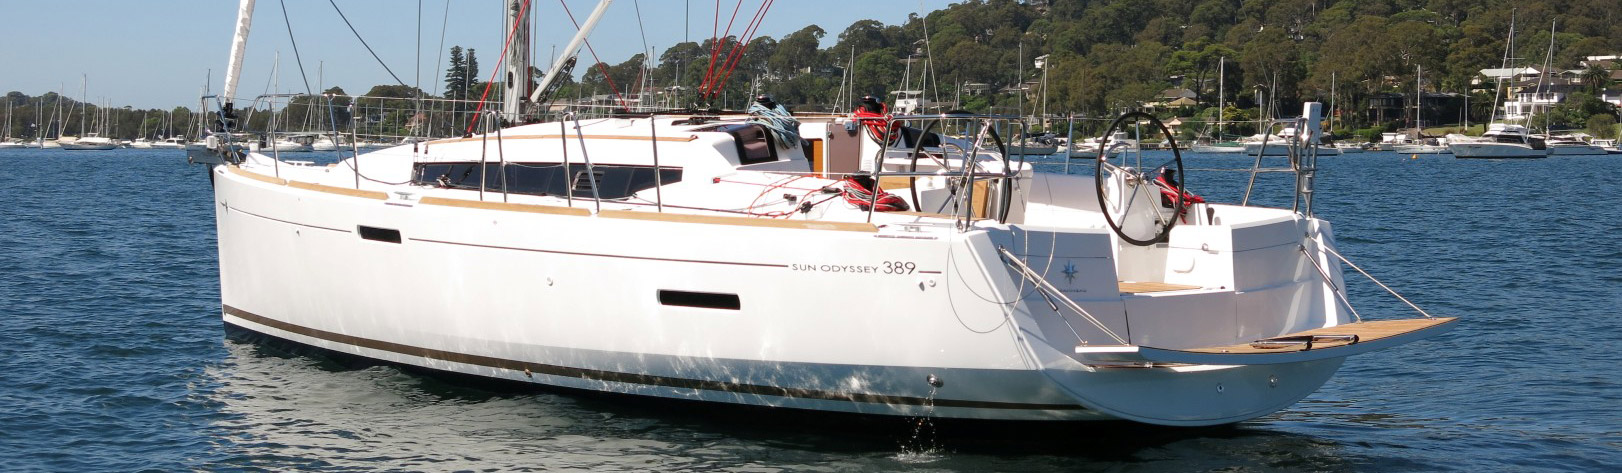 Voilier Jeanneau Sun Odyssee 389, voilier à Marseille, Yacht Méditerranée.